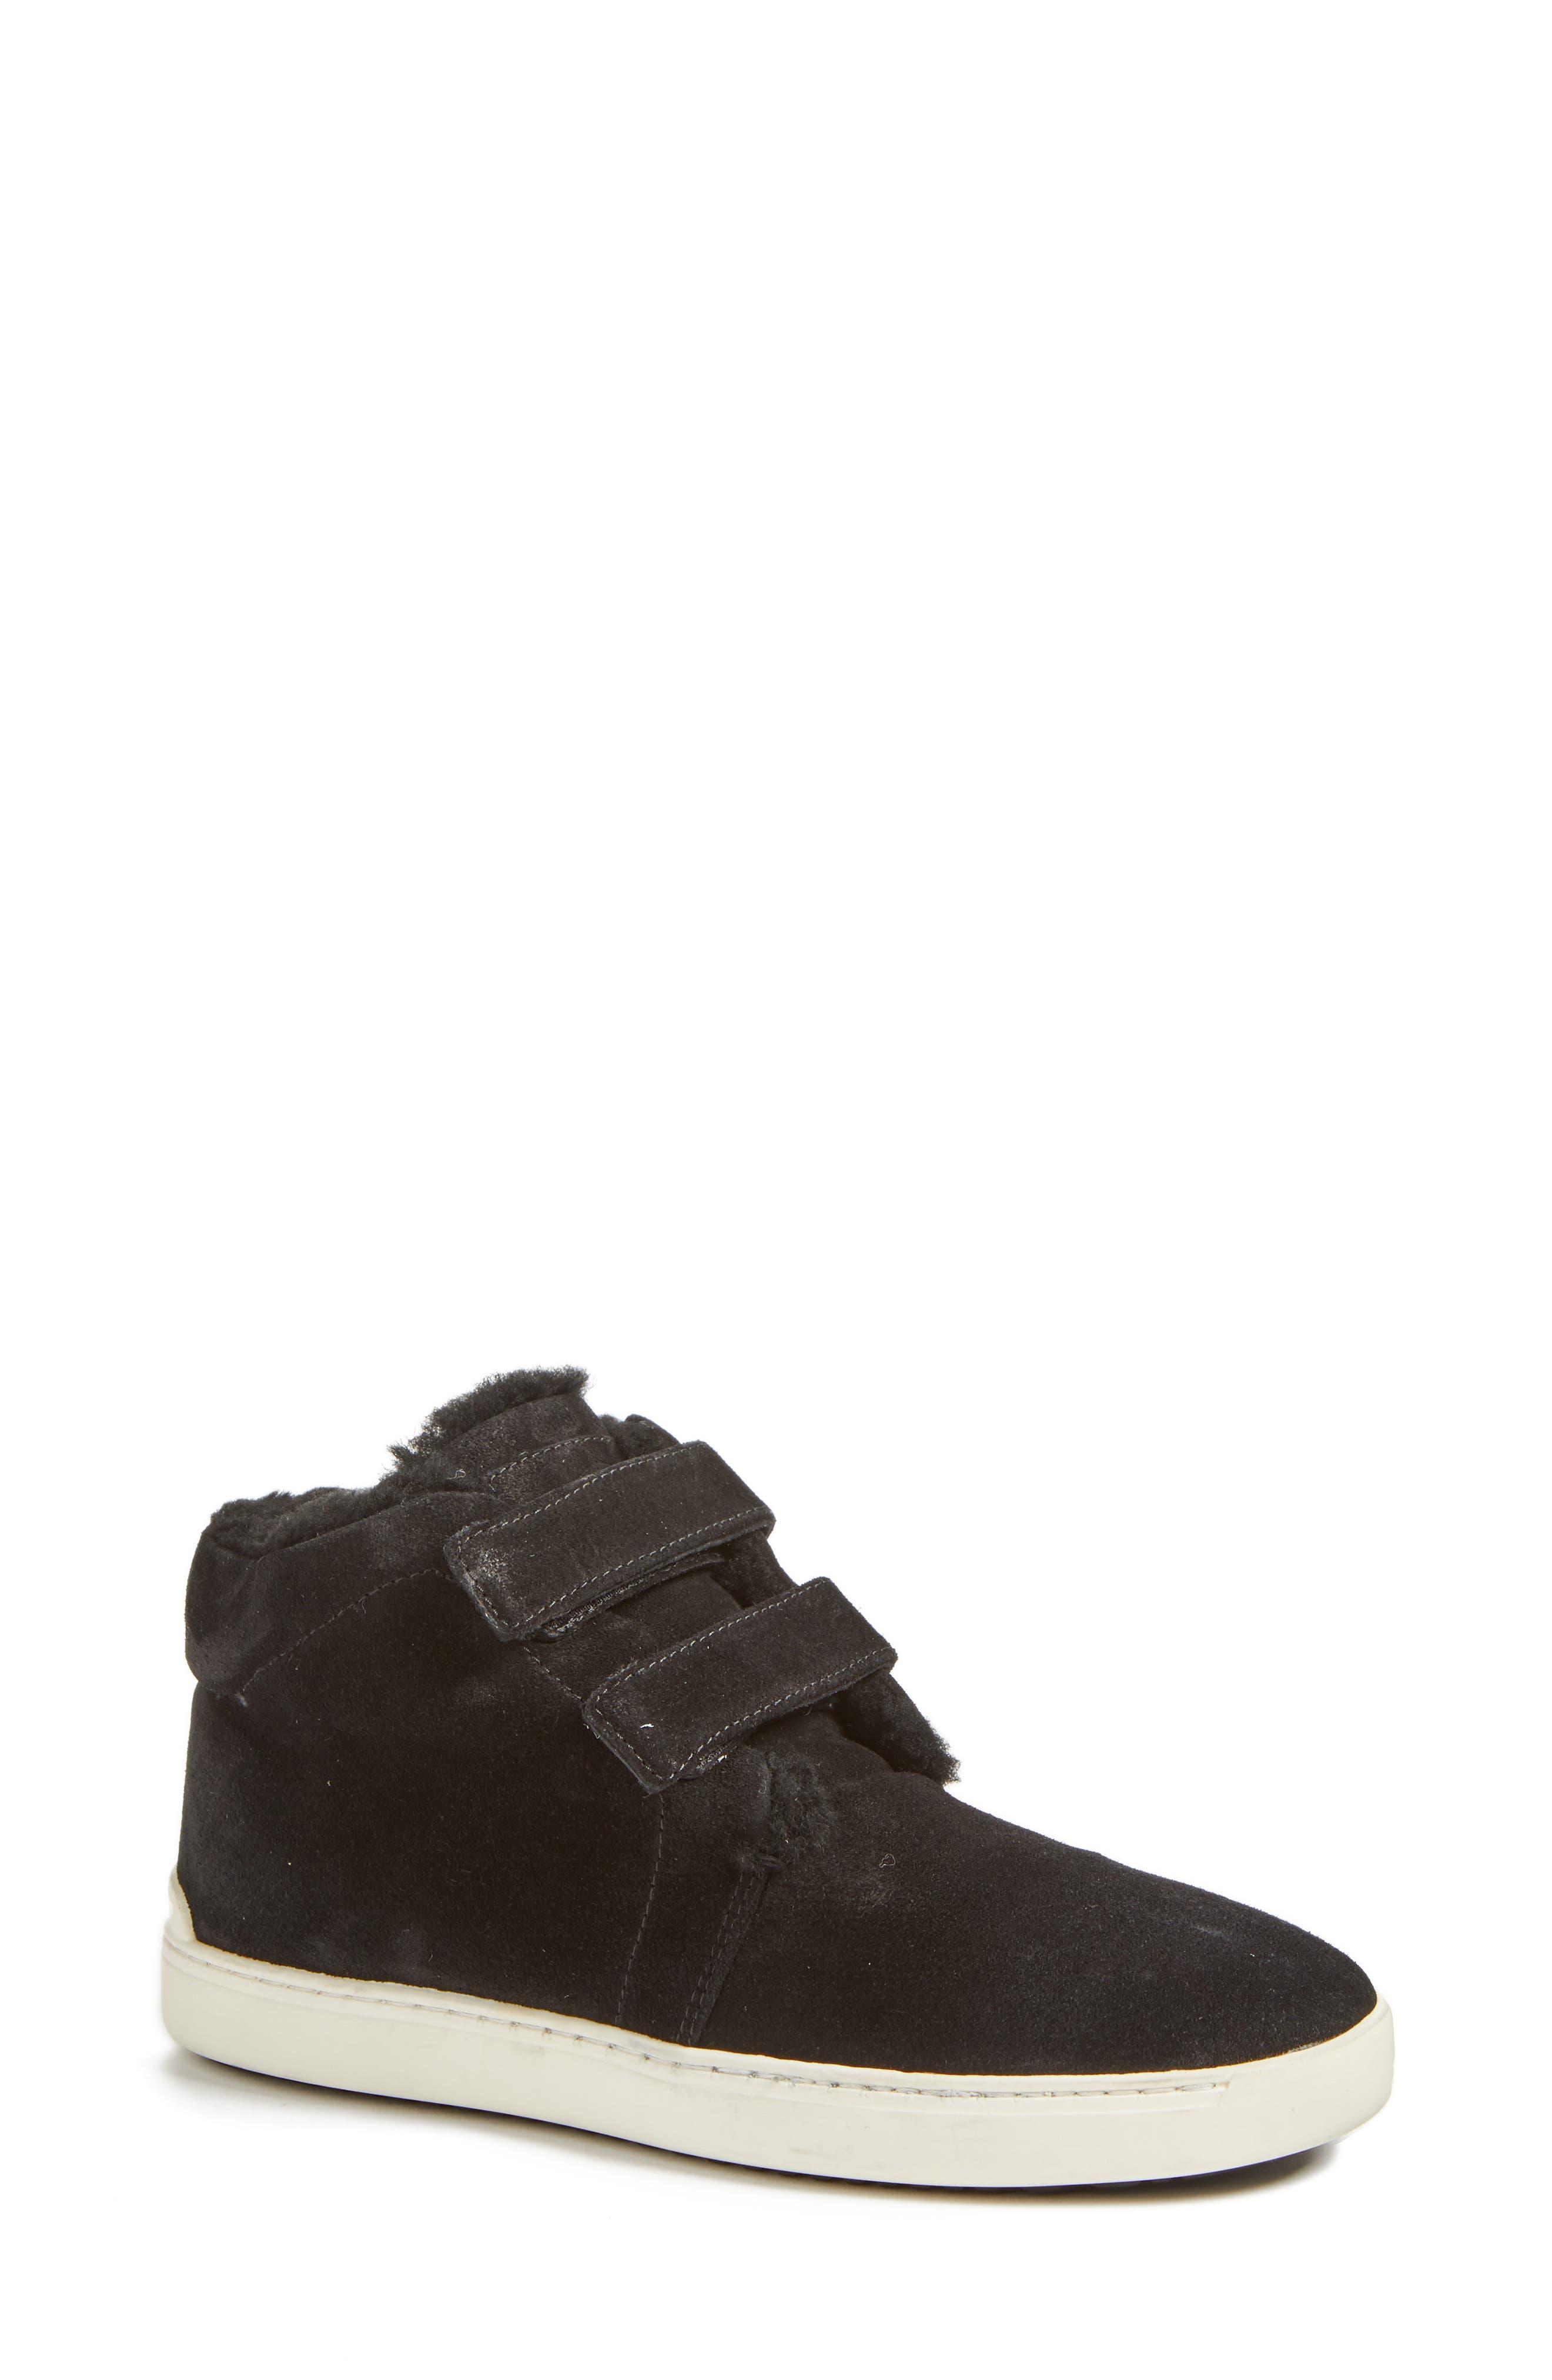 Kent Genuine Shearling Lined Sneaker,                         Main,                         color, 008